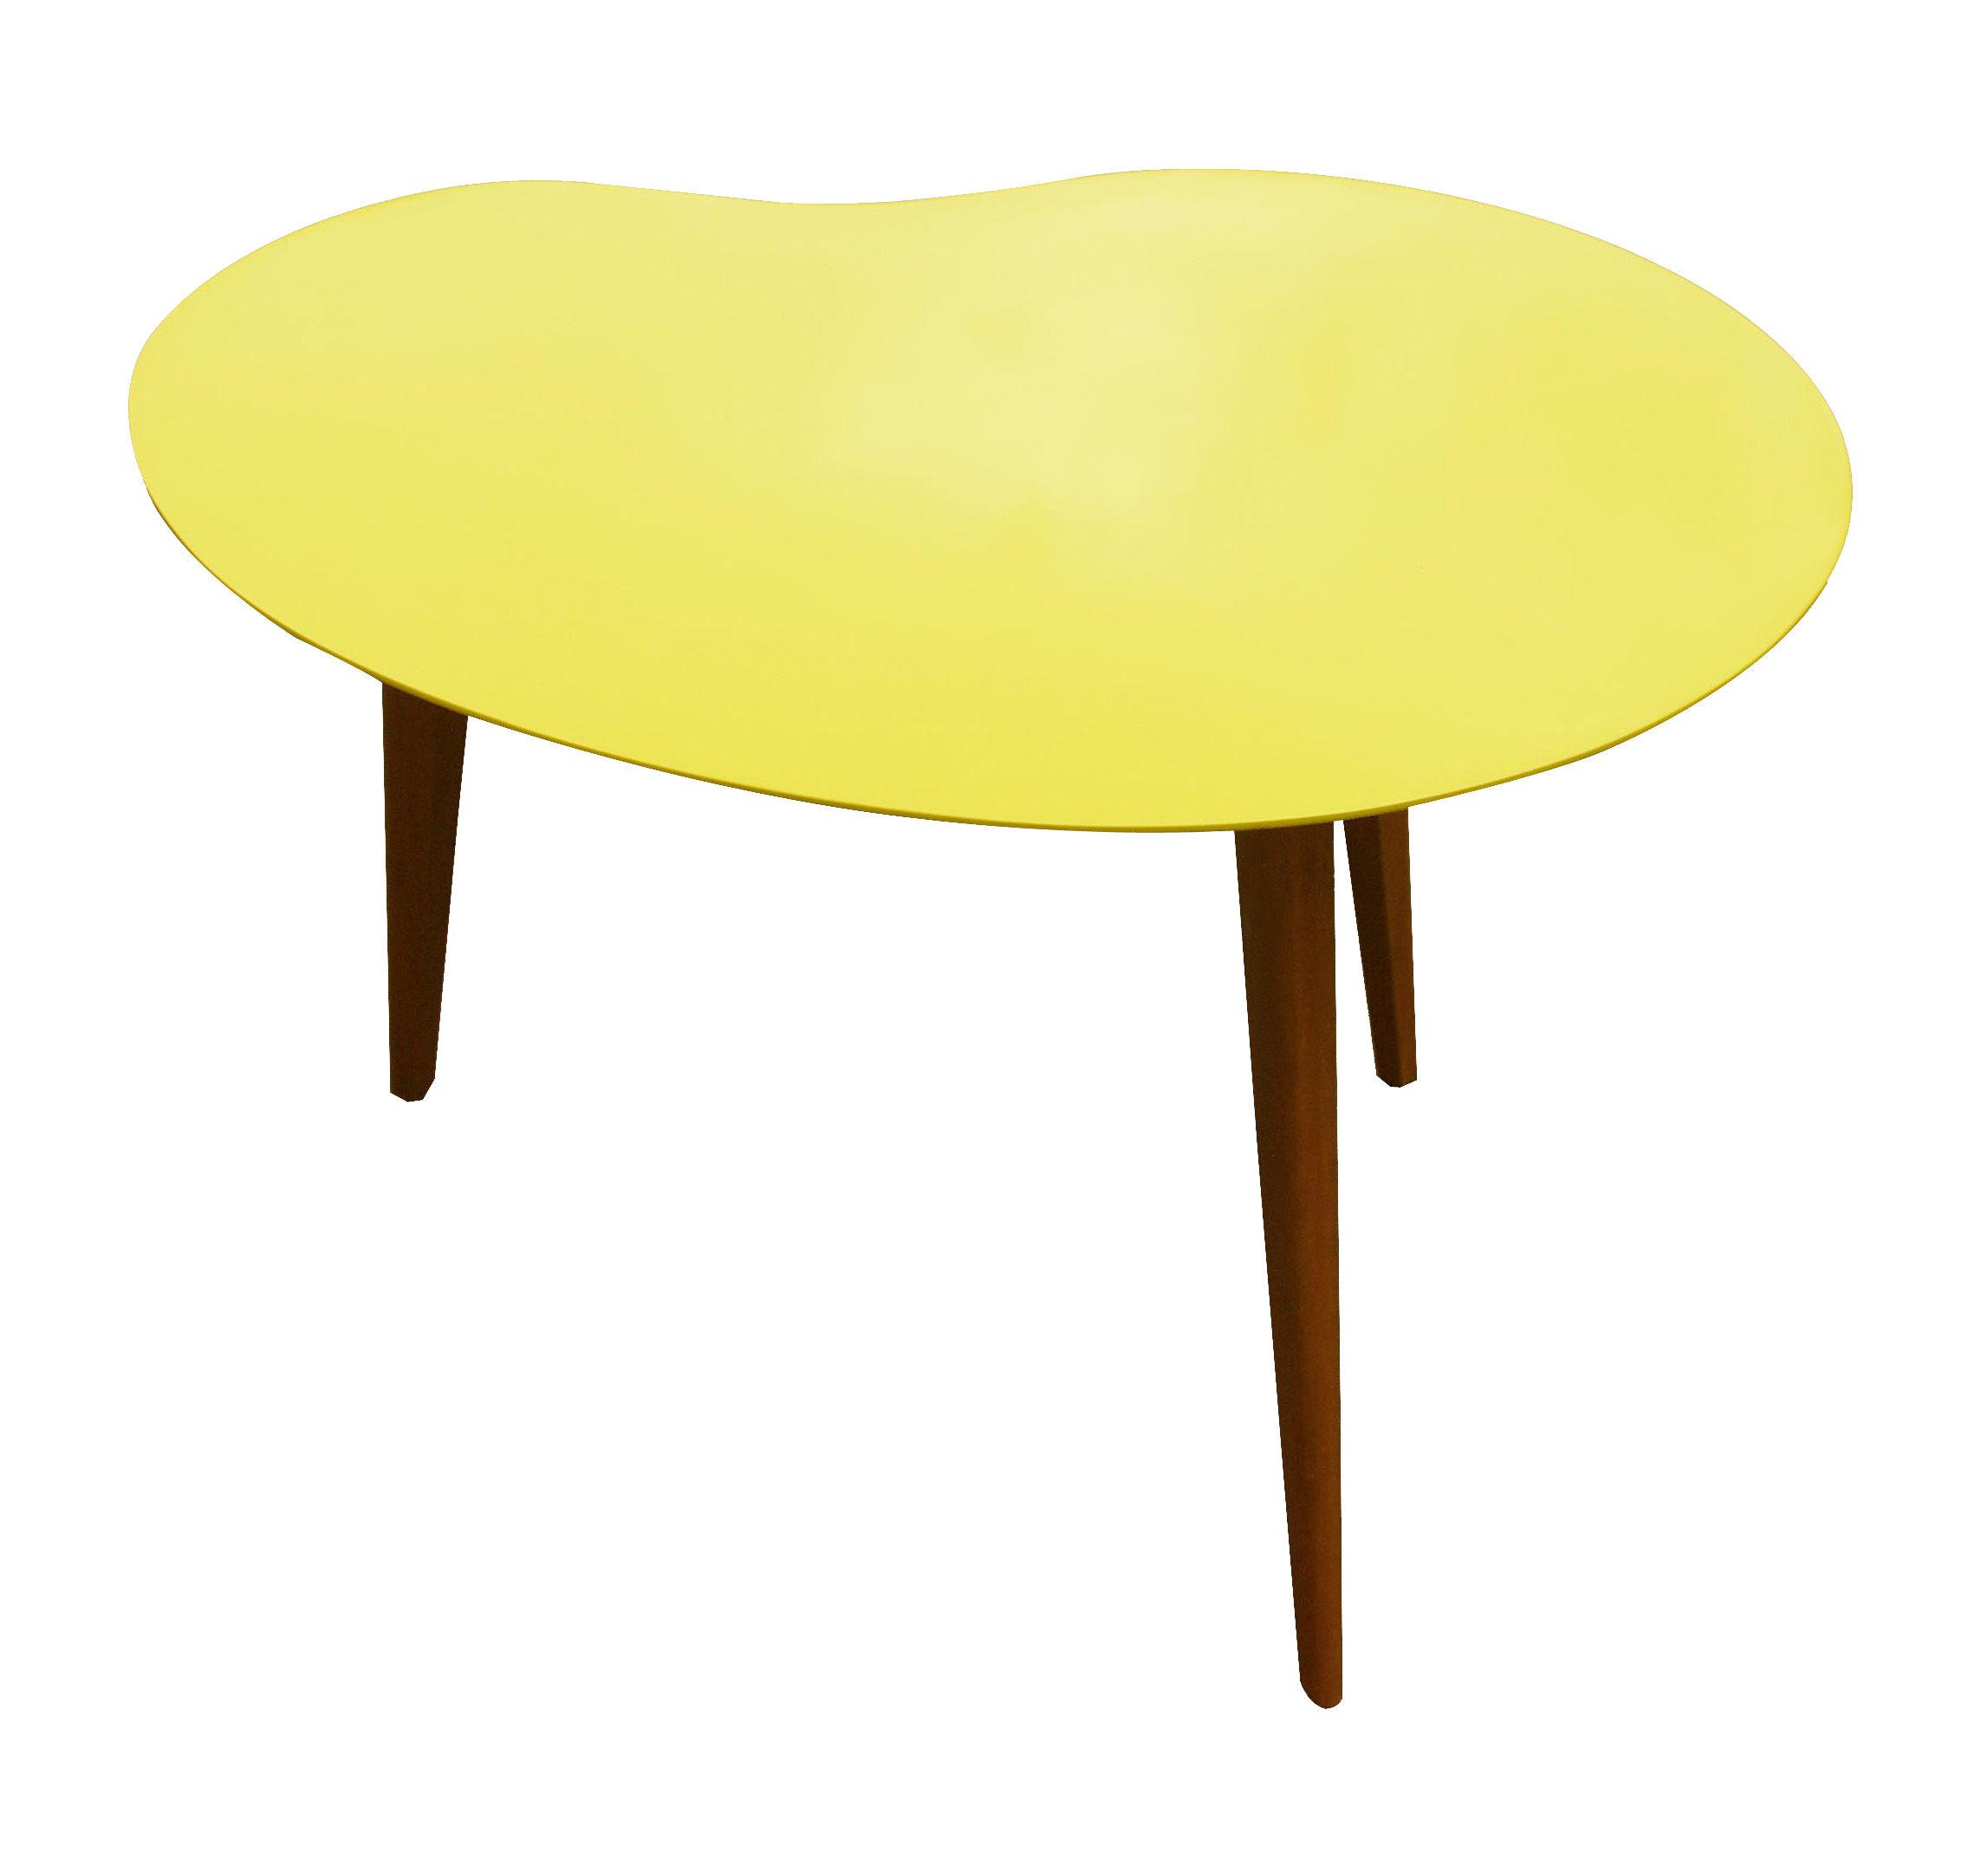 Table basse Lalinde haricot - Small Jaune / Pieds chêne - Sentou ...